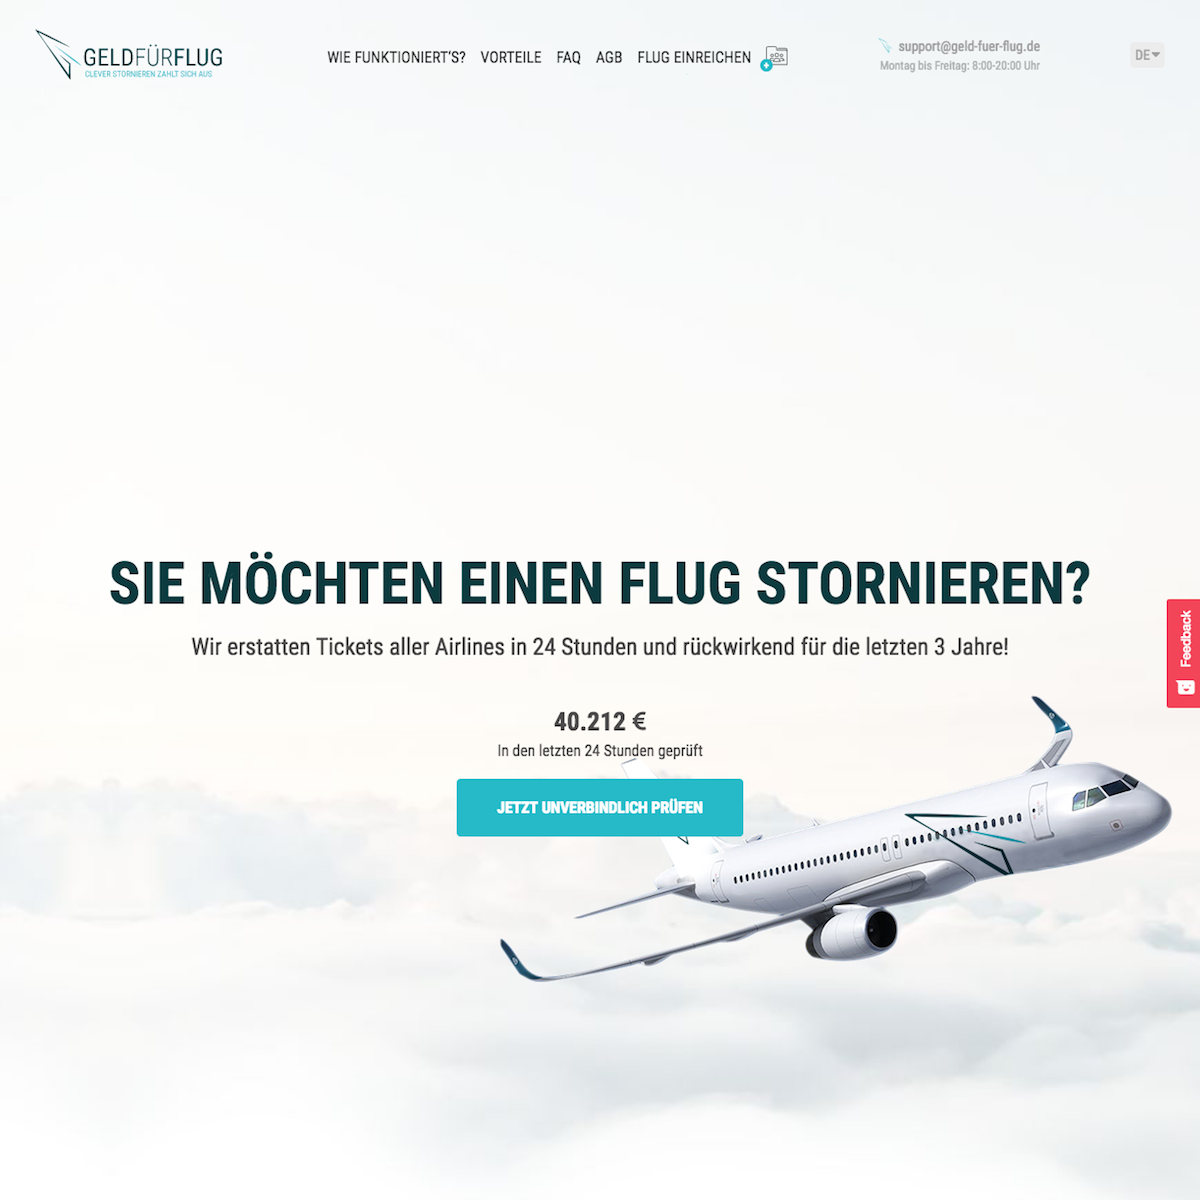 Geld-für-Flug